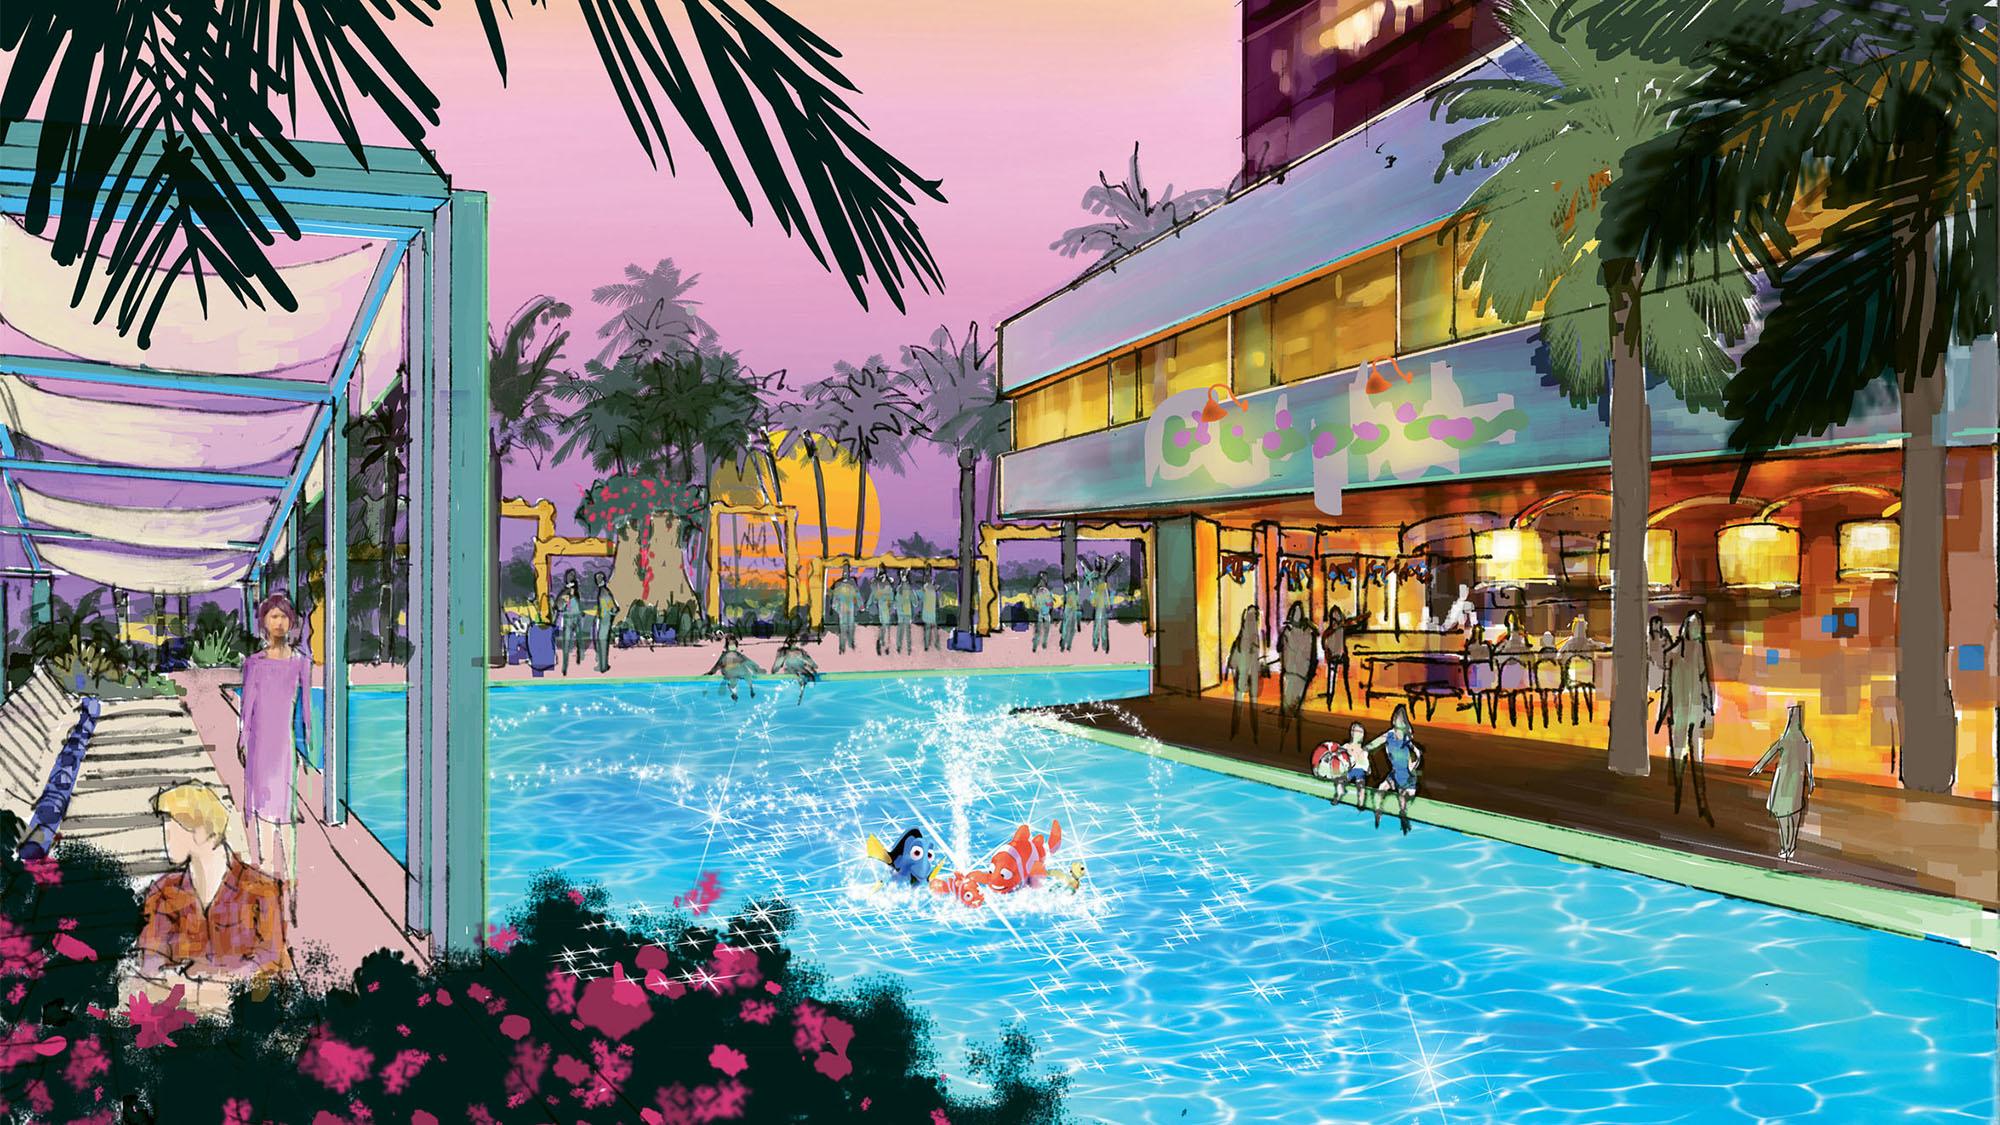 Disneyland Plans Hotel Eyes 2021 Opening Travel Weekly